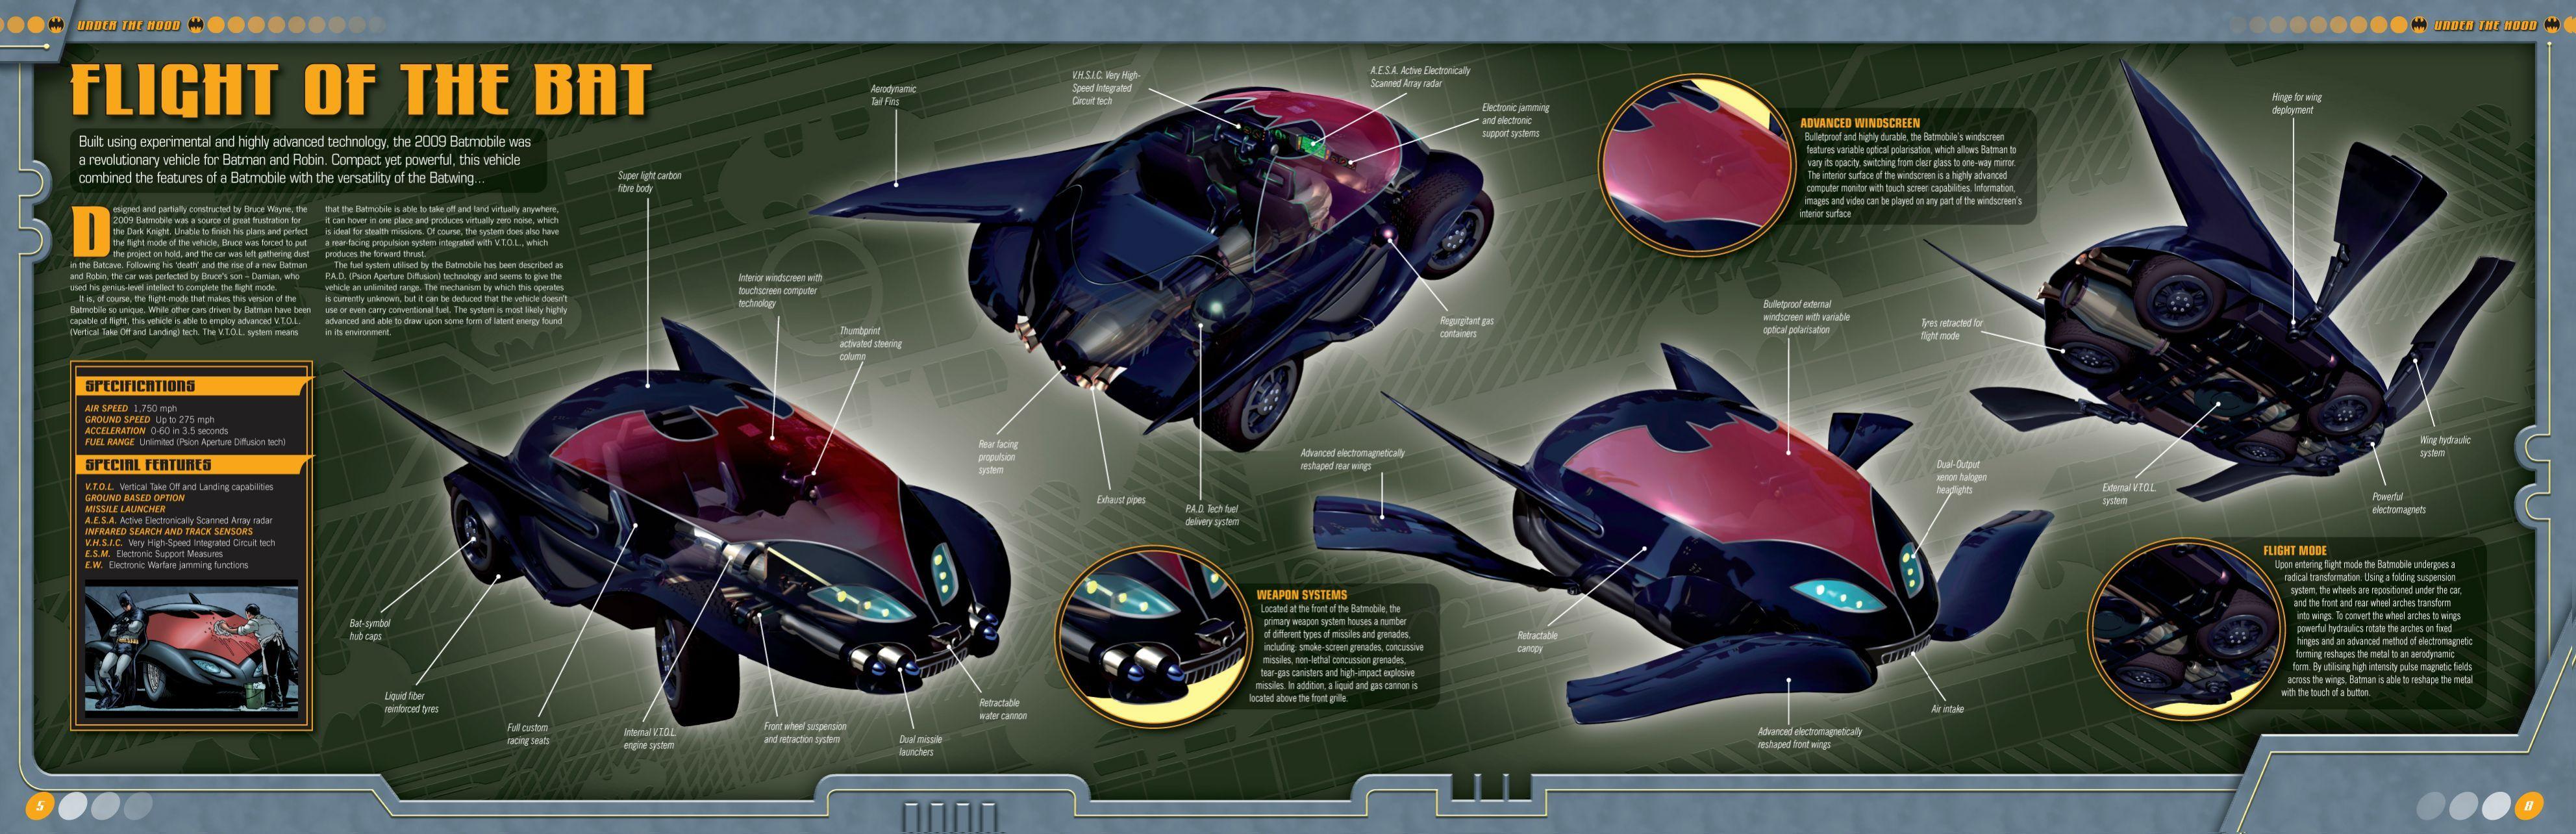 Batman Automobilia issue #15   Bat Vehicles   Batmobile